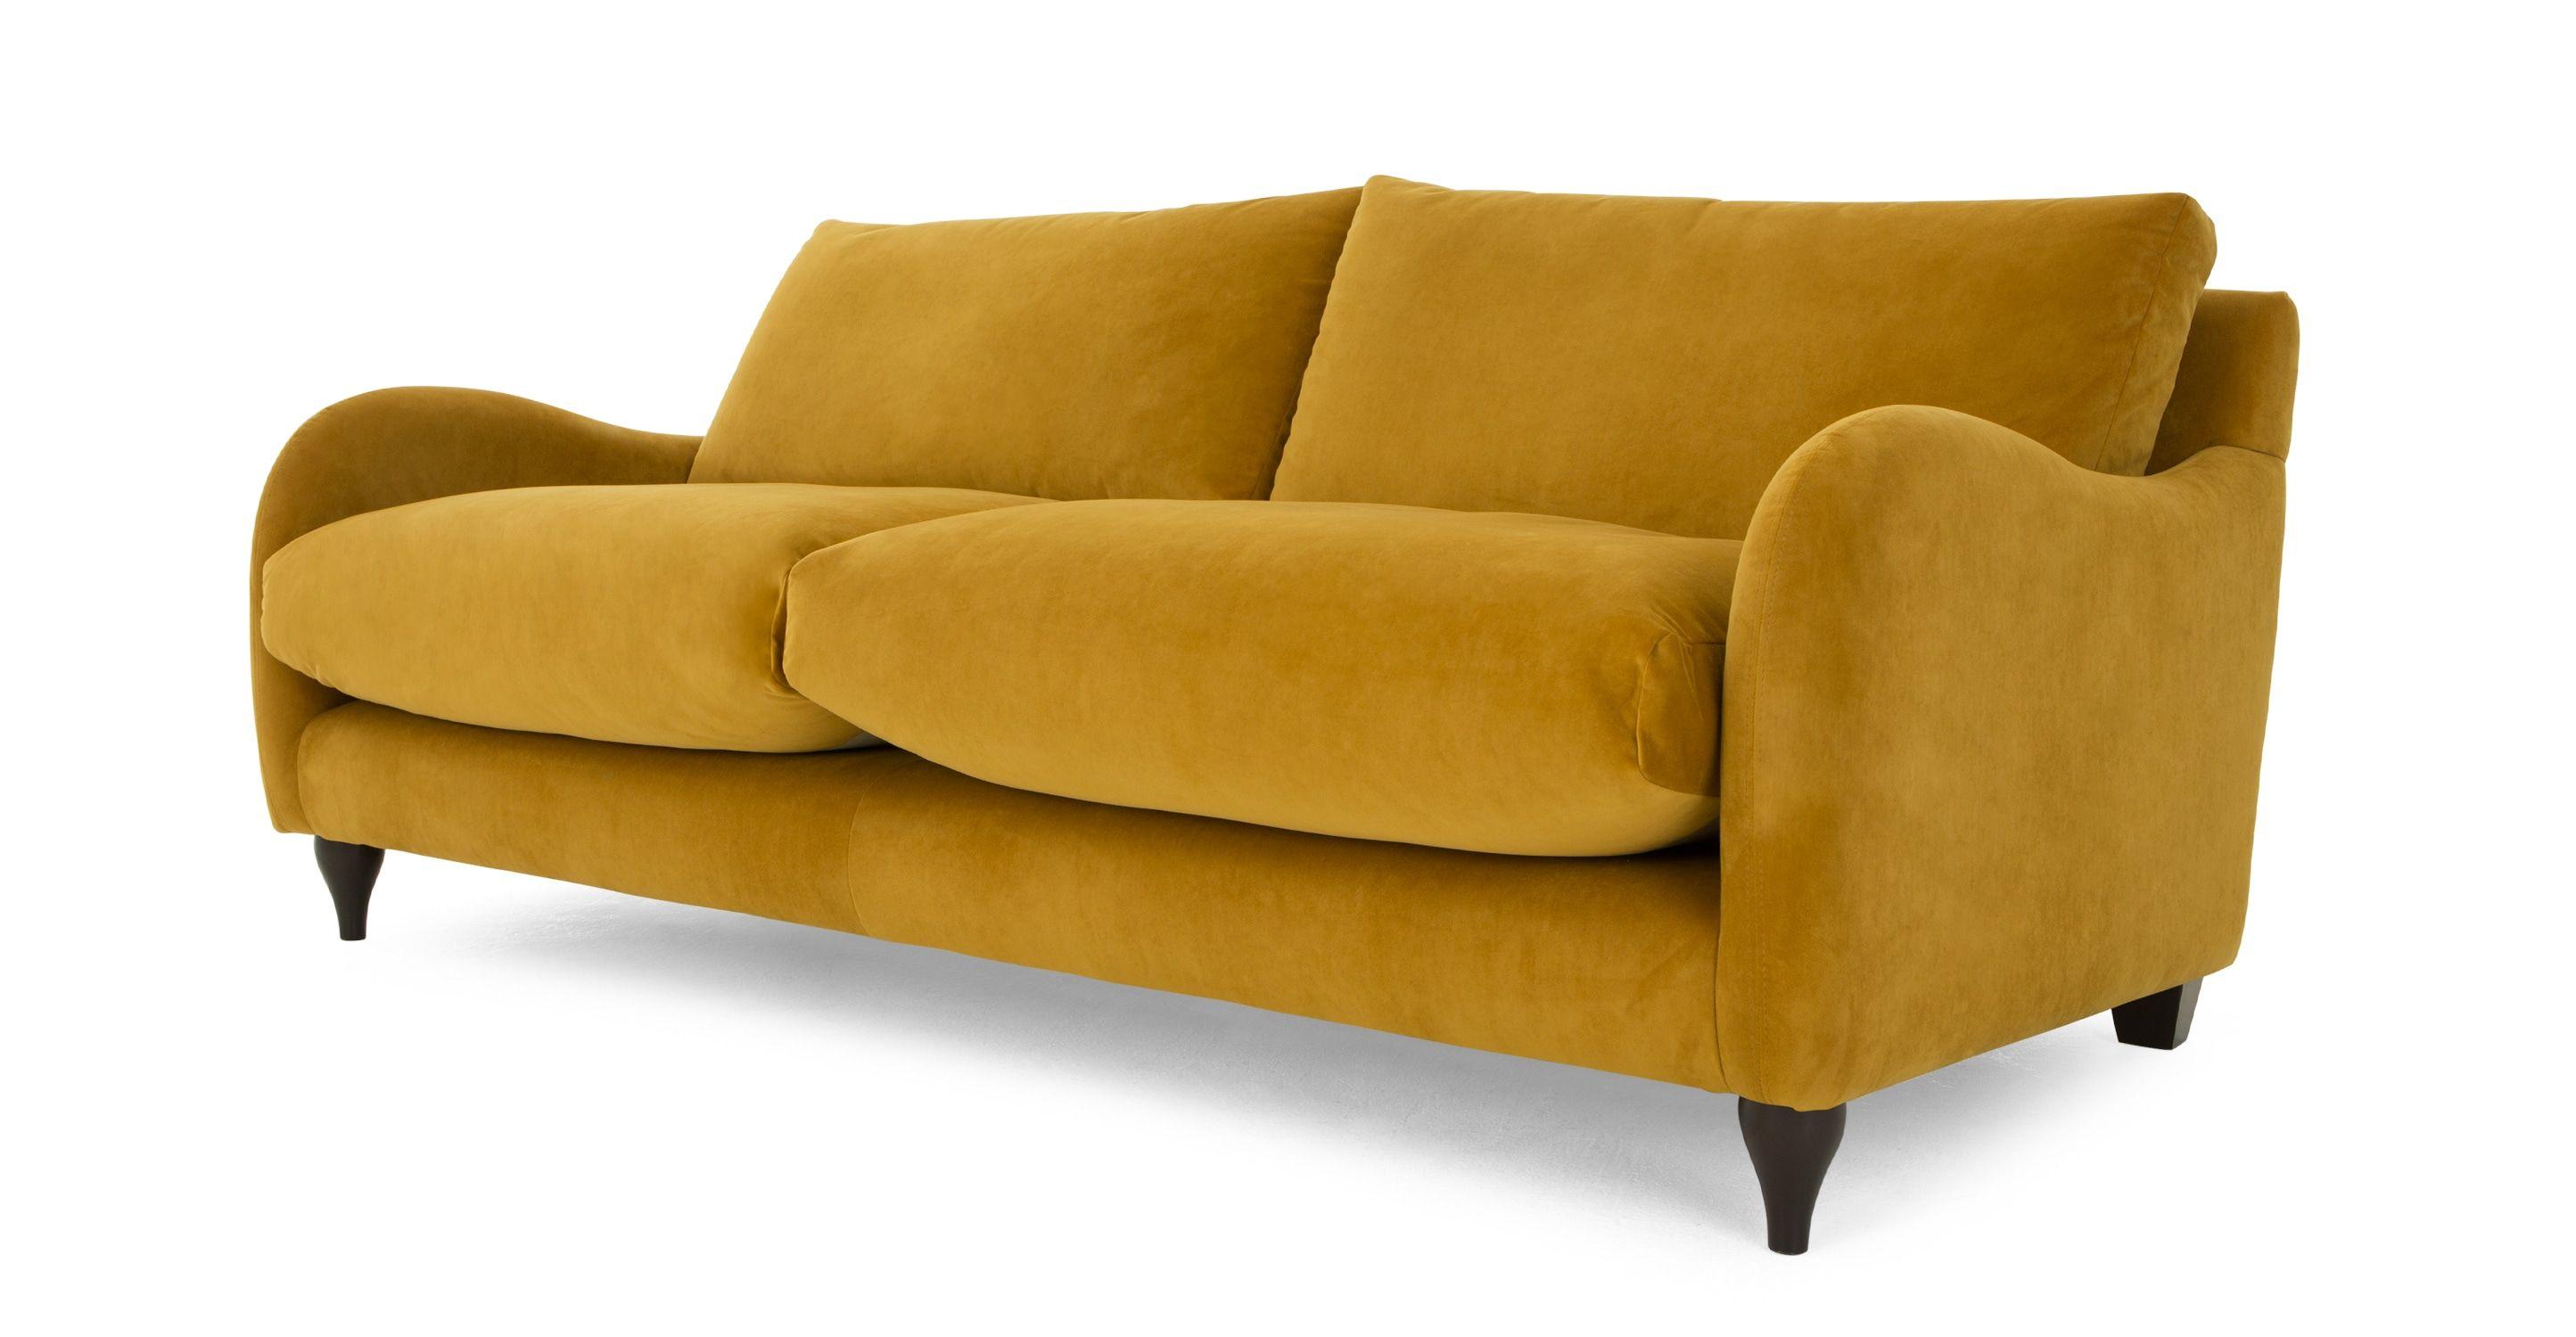 Butterbump Sofa